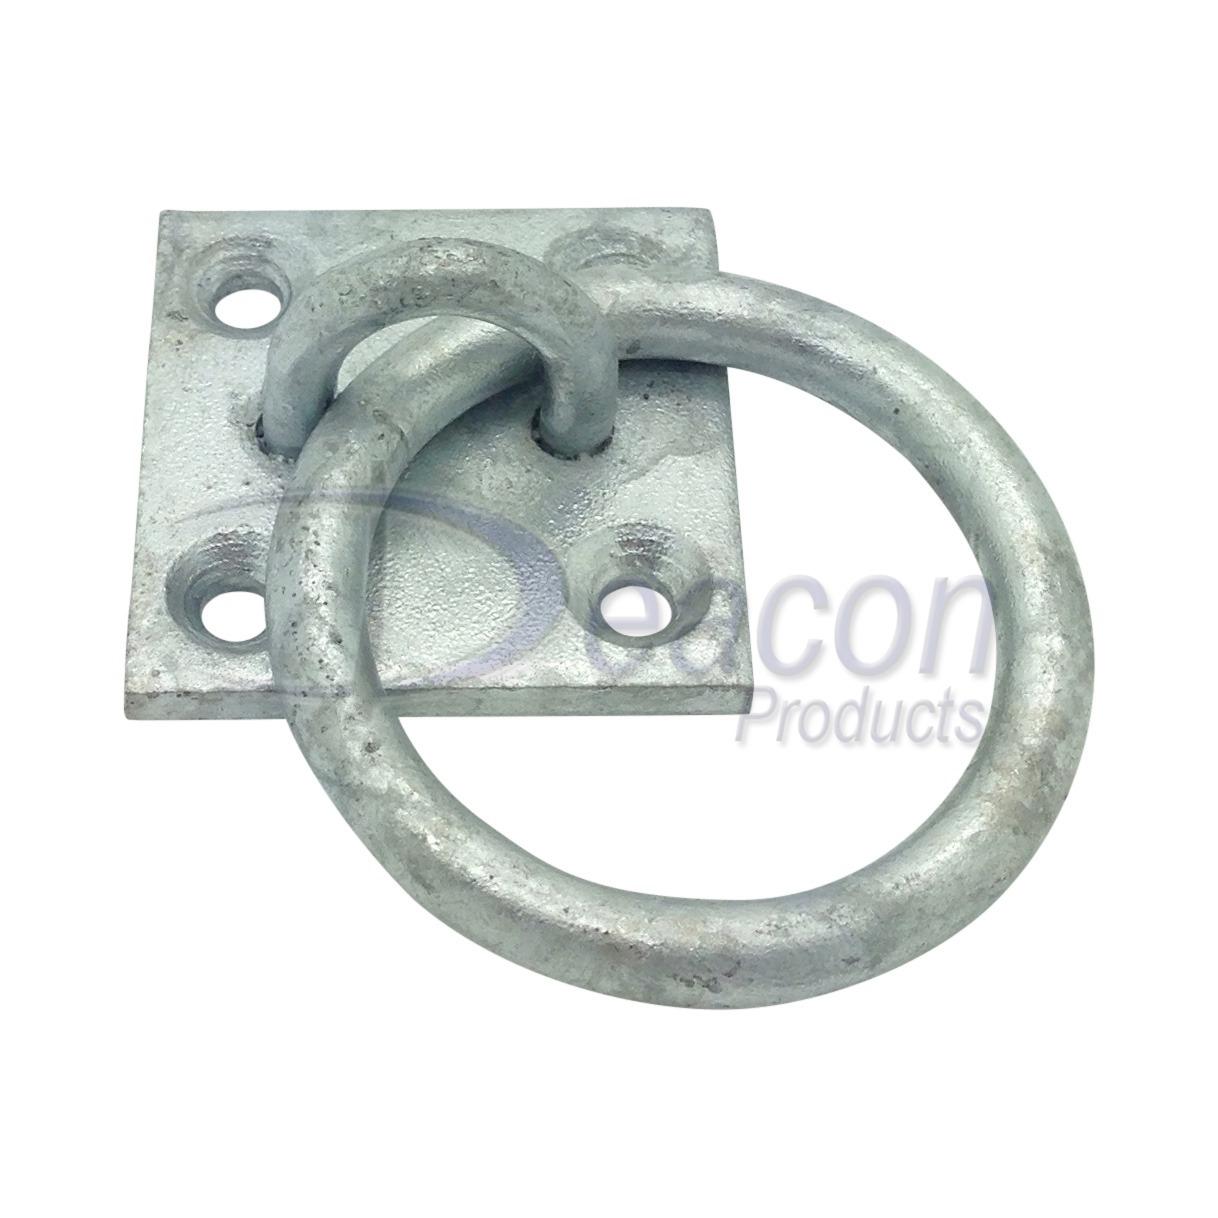 galvanized-square-plate-ring